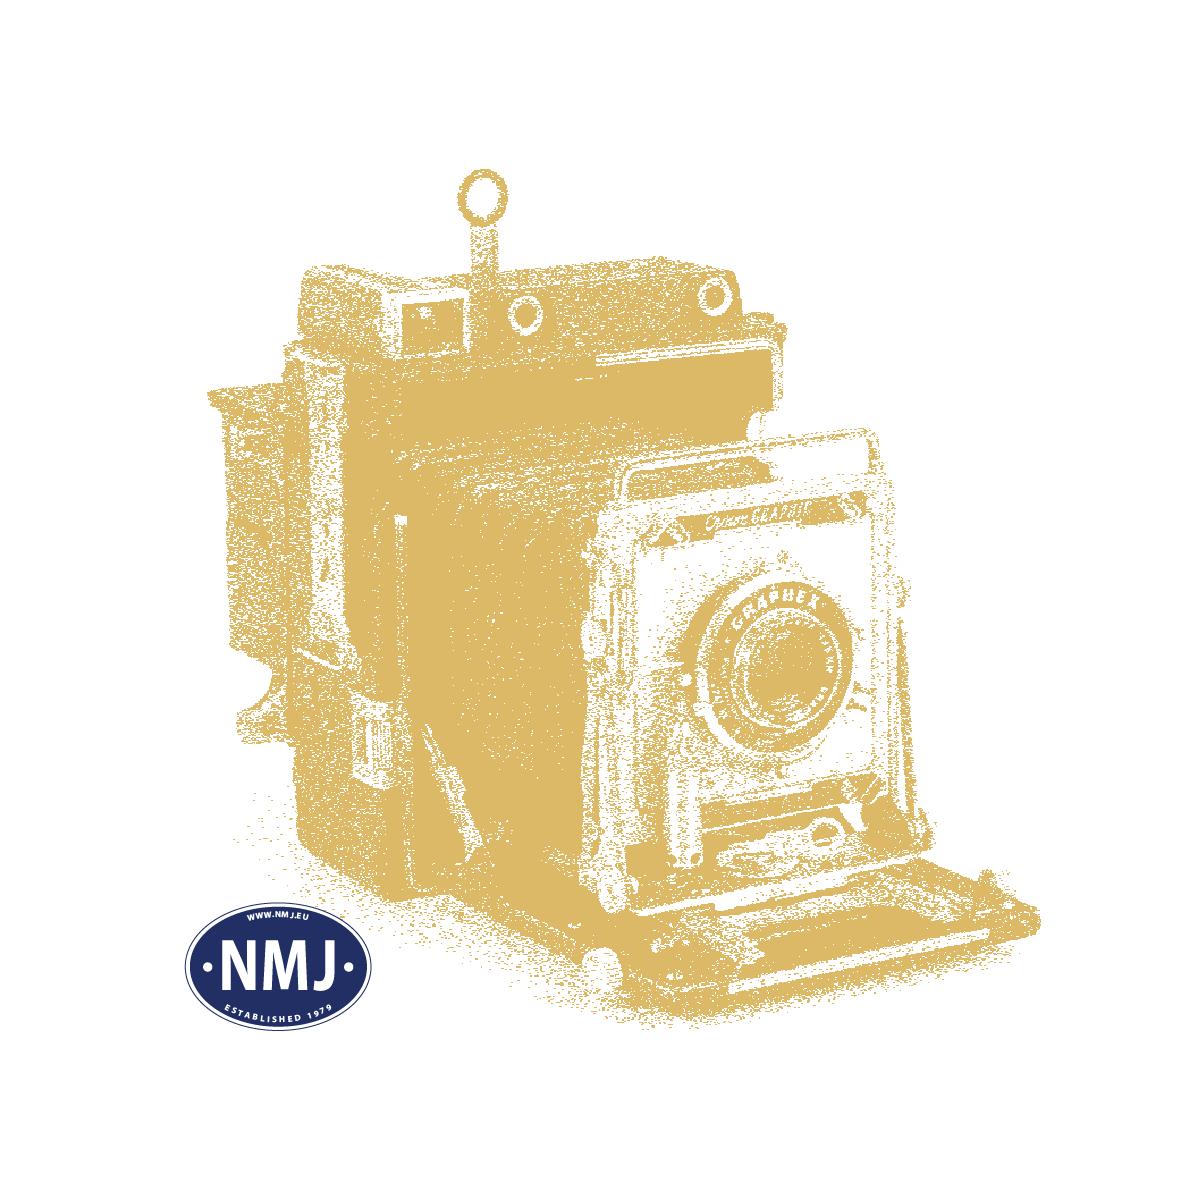 NMJ0.21307 - NMJ Superline NSB DF37.21307, 0-Scala